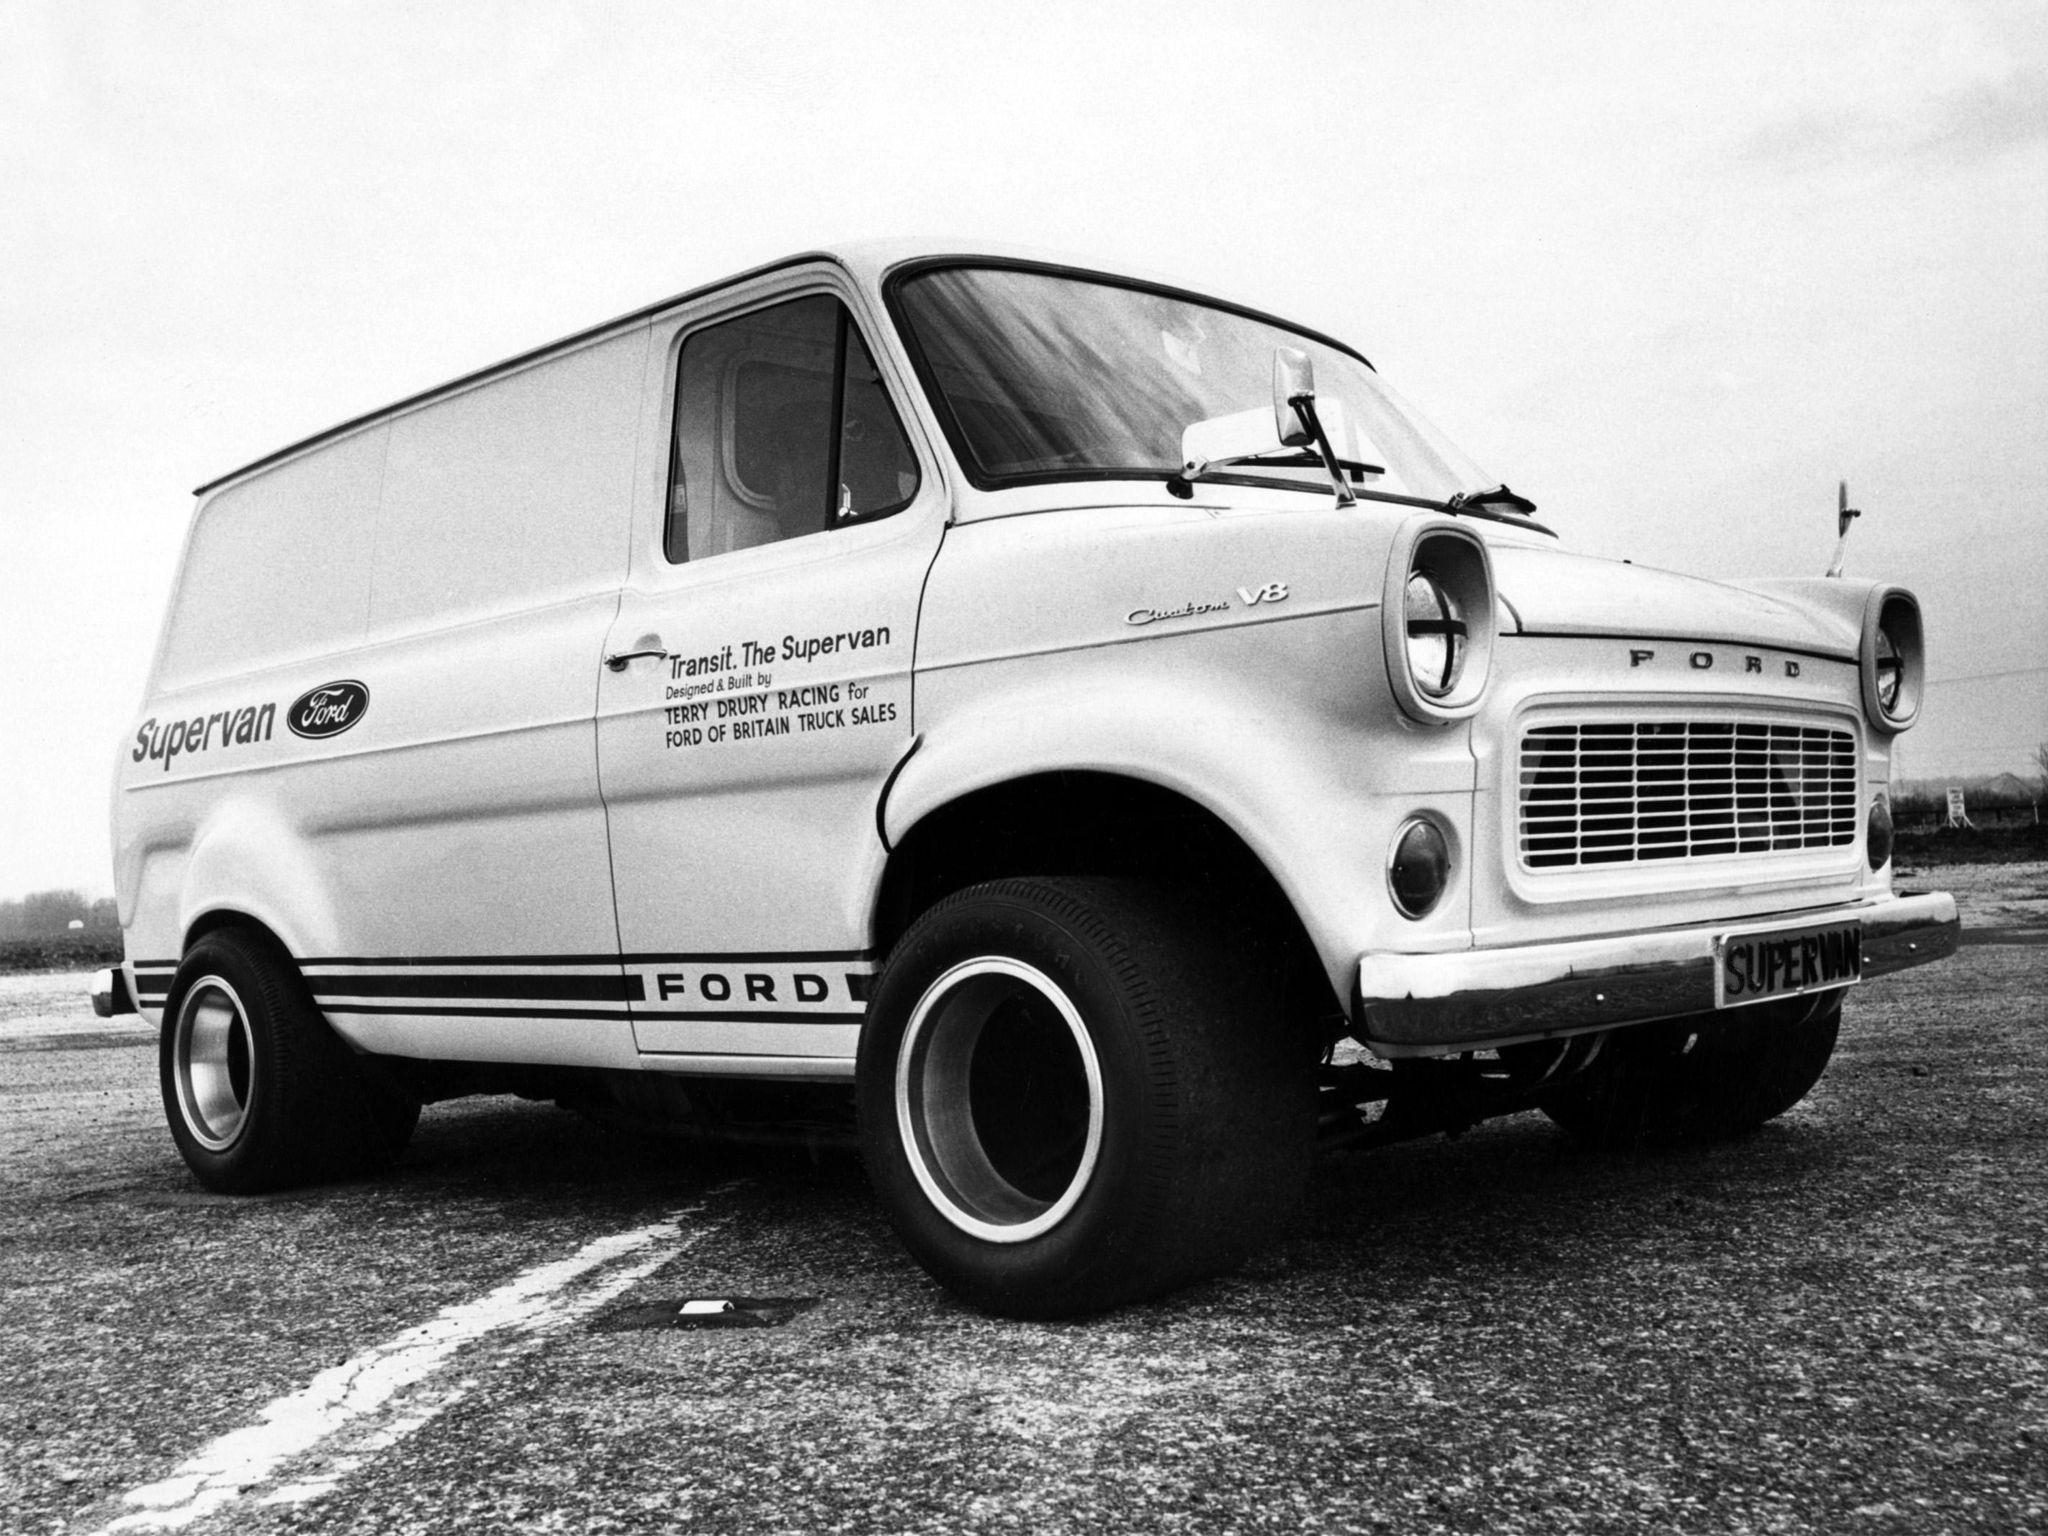 1971 ford transit supervan 4x4 hot rod rods classic van g wallpaper 2048x1536 168503